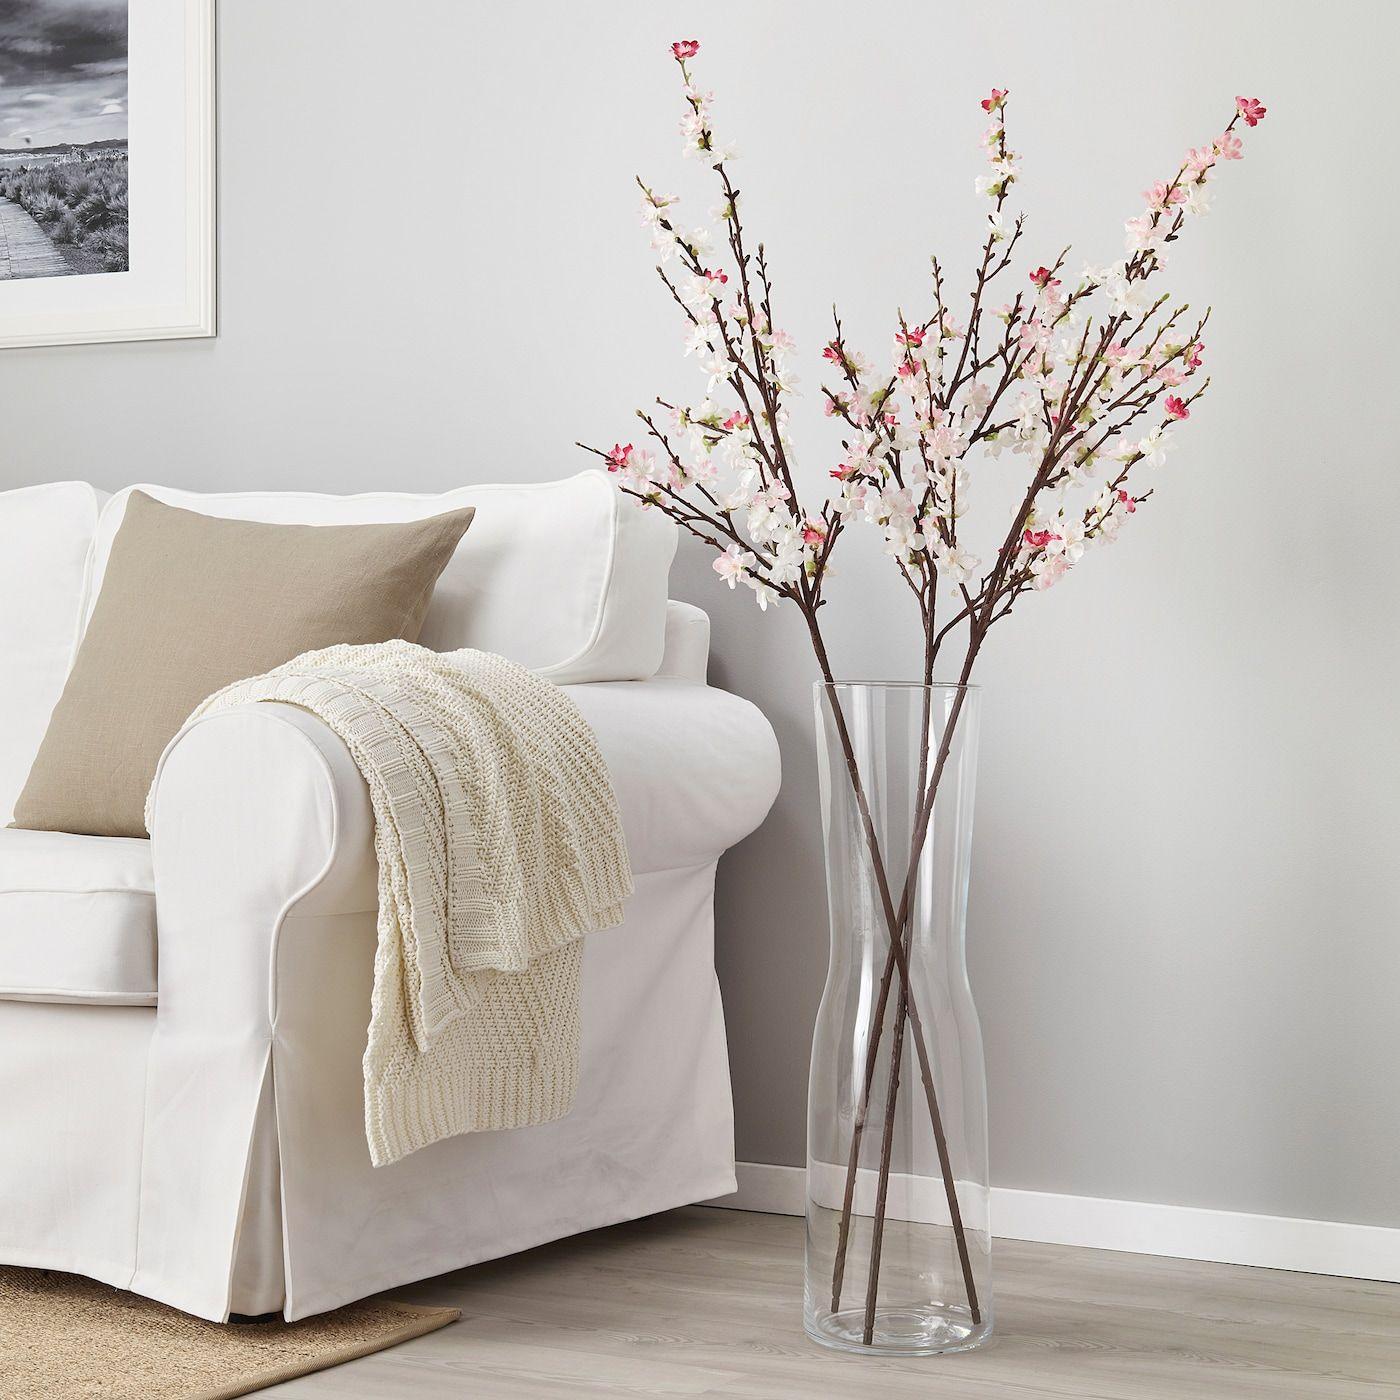 Smycka Artificial Flower Cherry Blossoms Pink Ikea In 2021 Ikea Artificial Flowers Fake Flowers Decor Floor Vase Decor